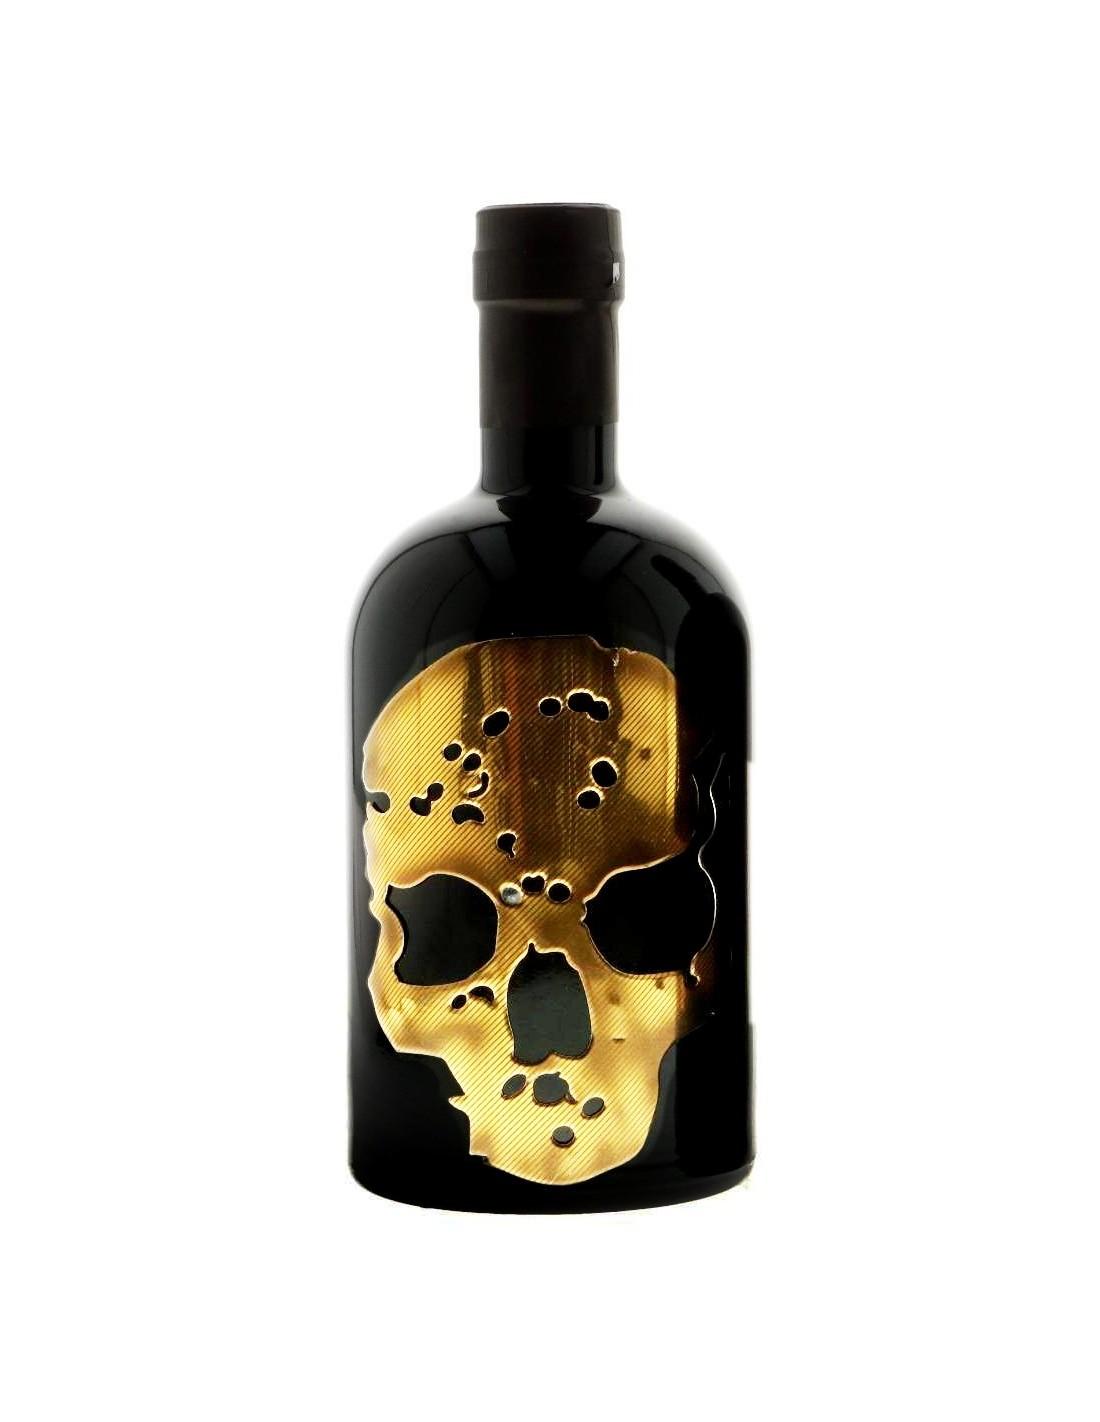 Vodca Ghost The Gold Skull 40% alc., 0.7L, Marea Britanie